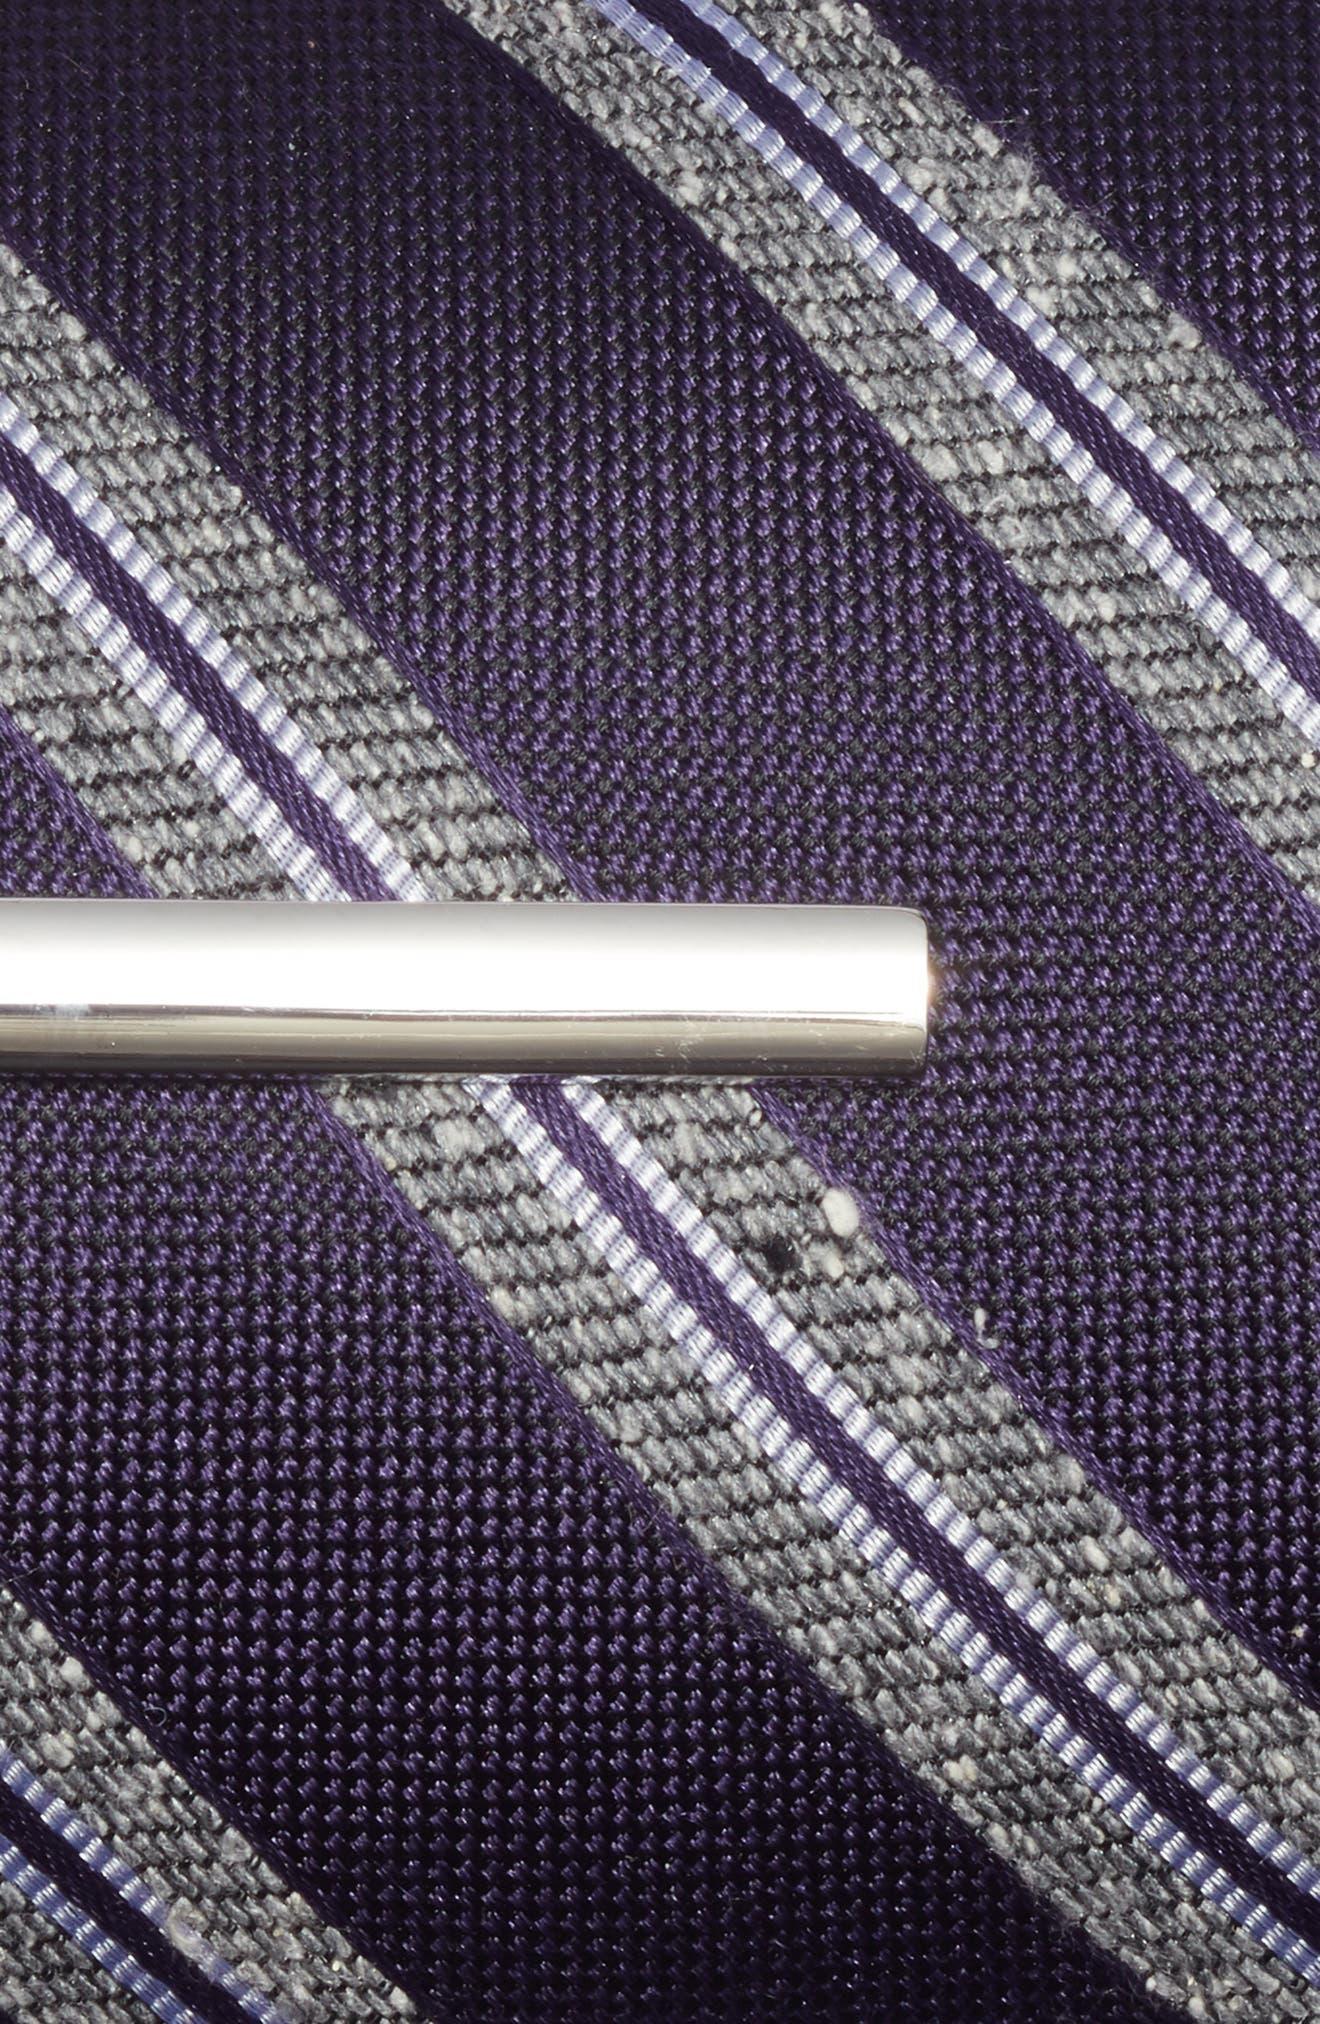 Edison Stripe 3-Piece Skinny Tie Style Box,                             Alternate thumbnail 3, color,                             Eggplant